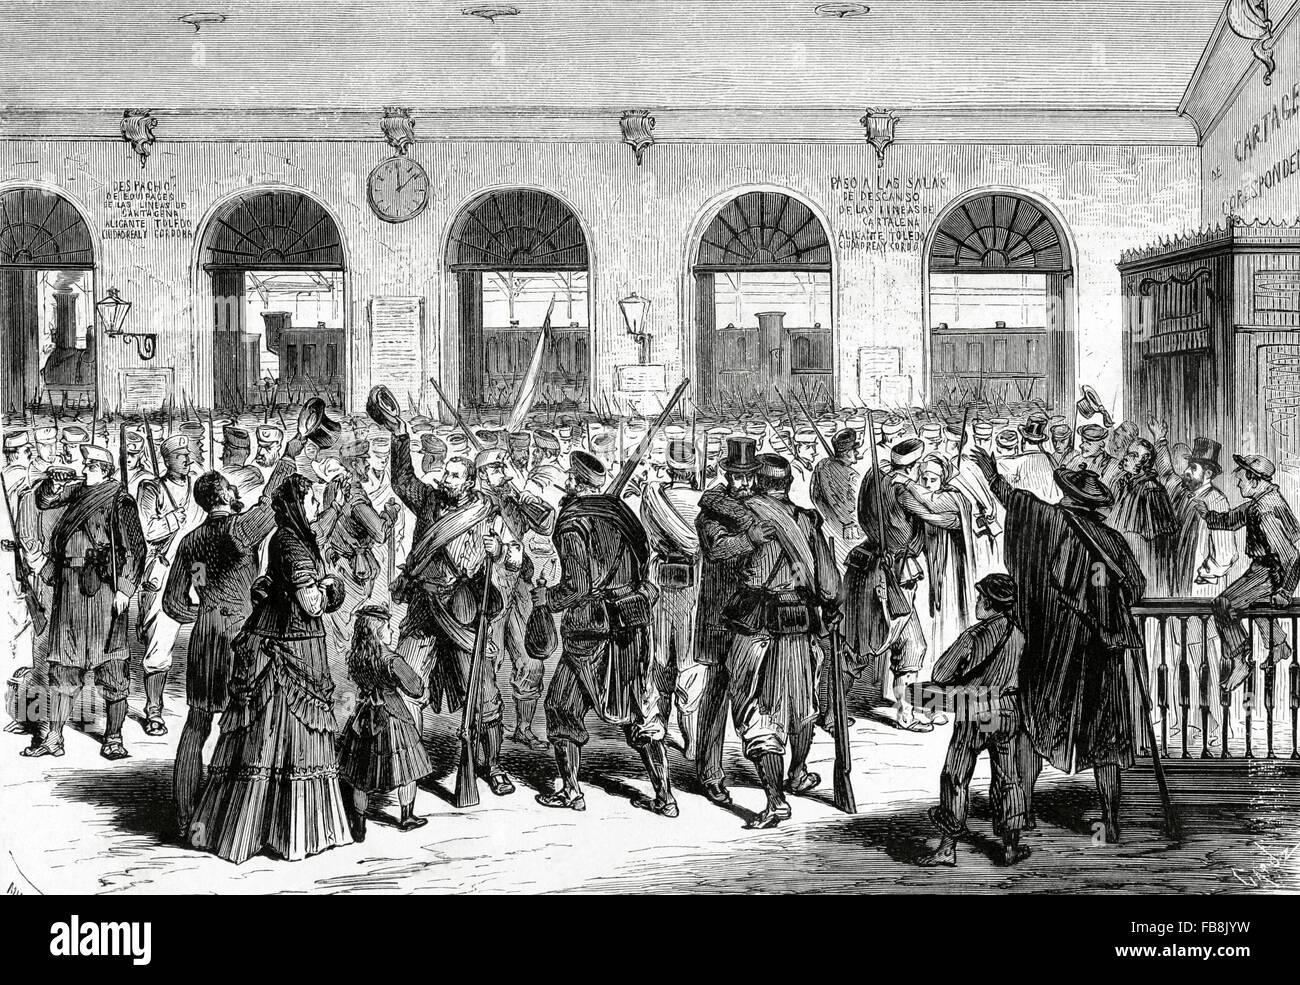 Third Carlist War (1872-1876). Spain. Madrid. The  Battalion of Hunters of Santander departs to Cuba. Engraving - Stock Image